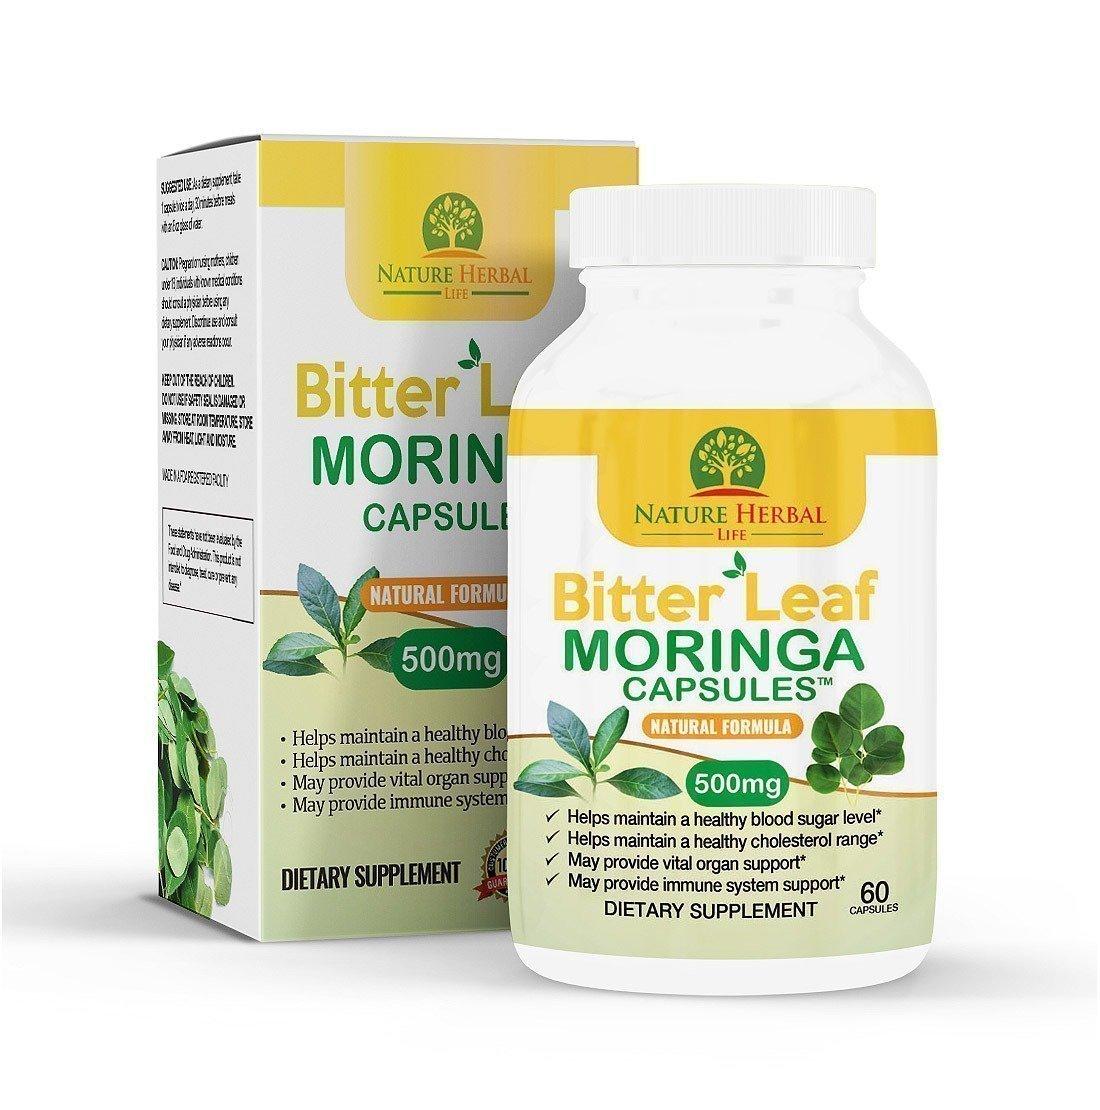 Bitter Leaf Moringa Capsules